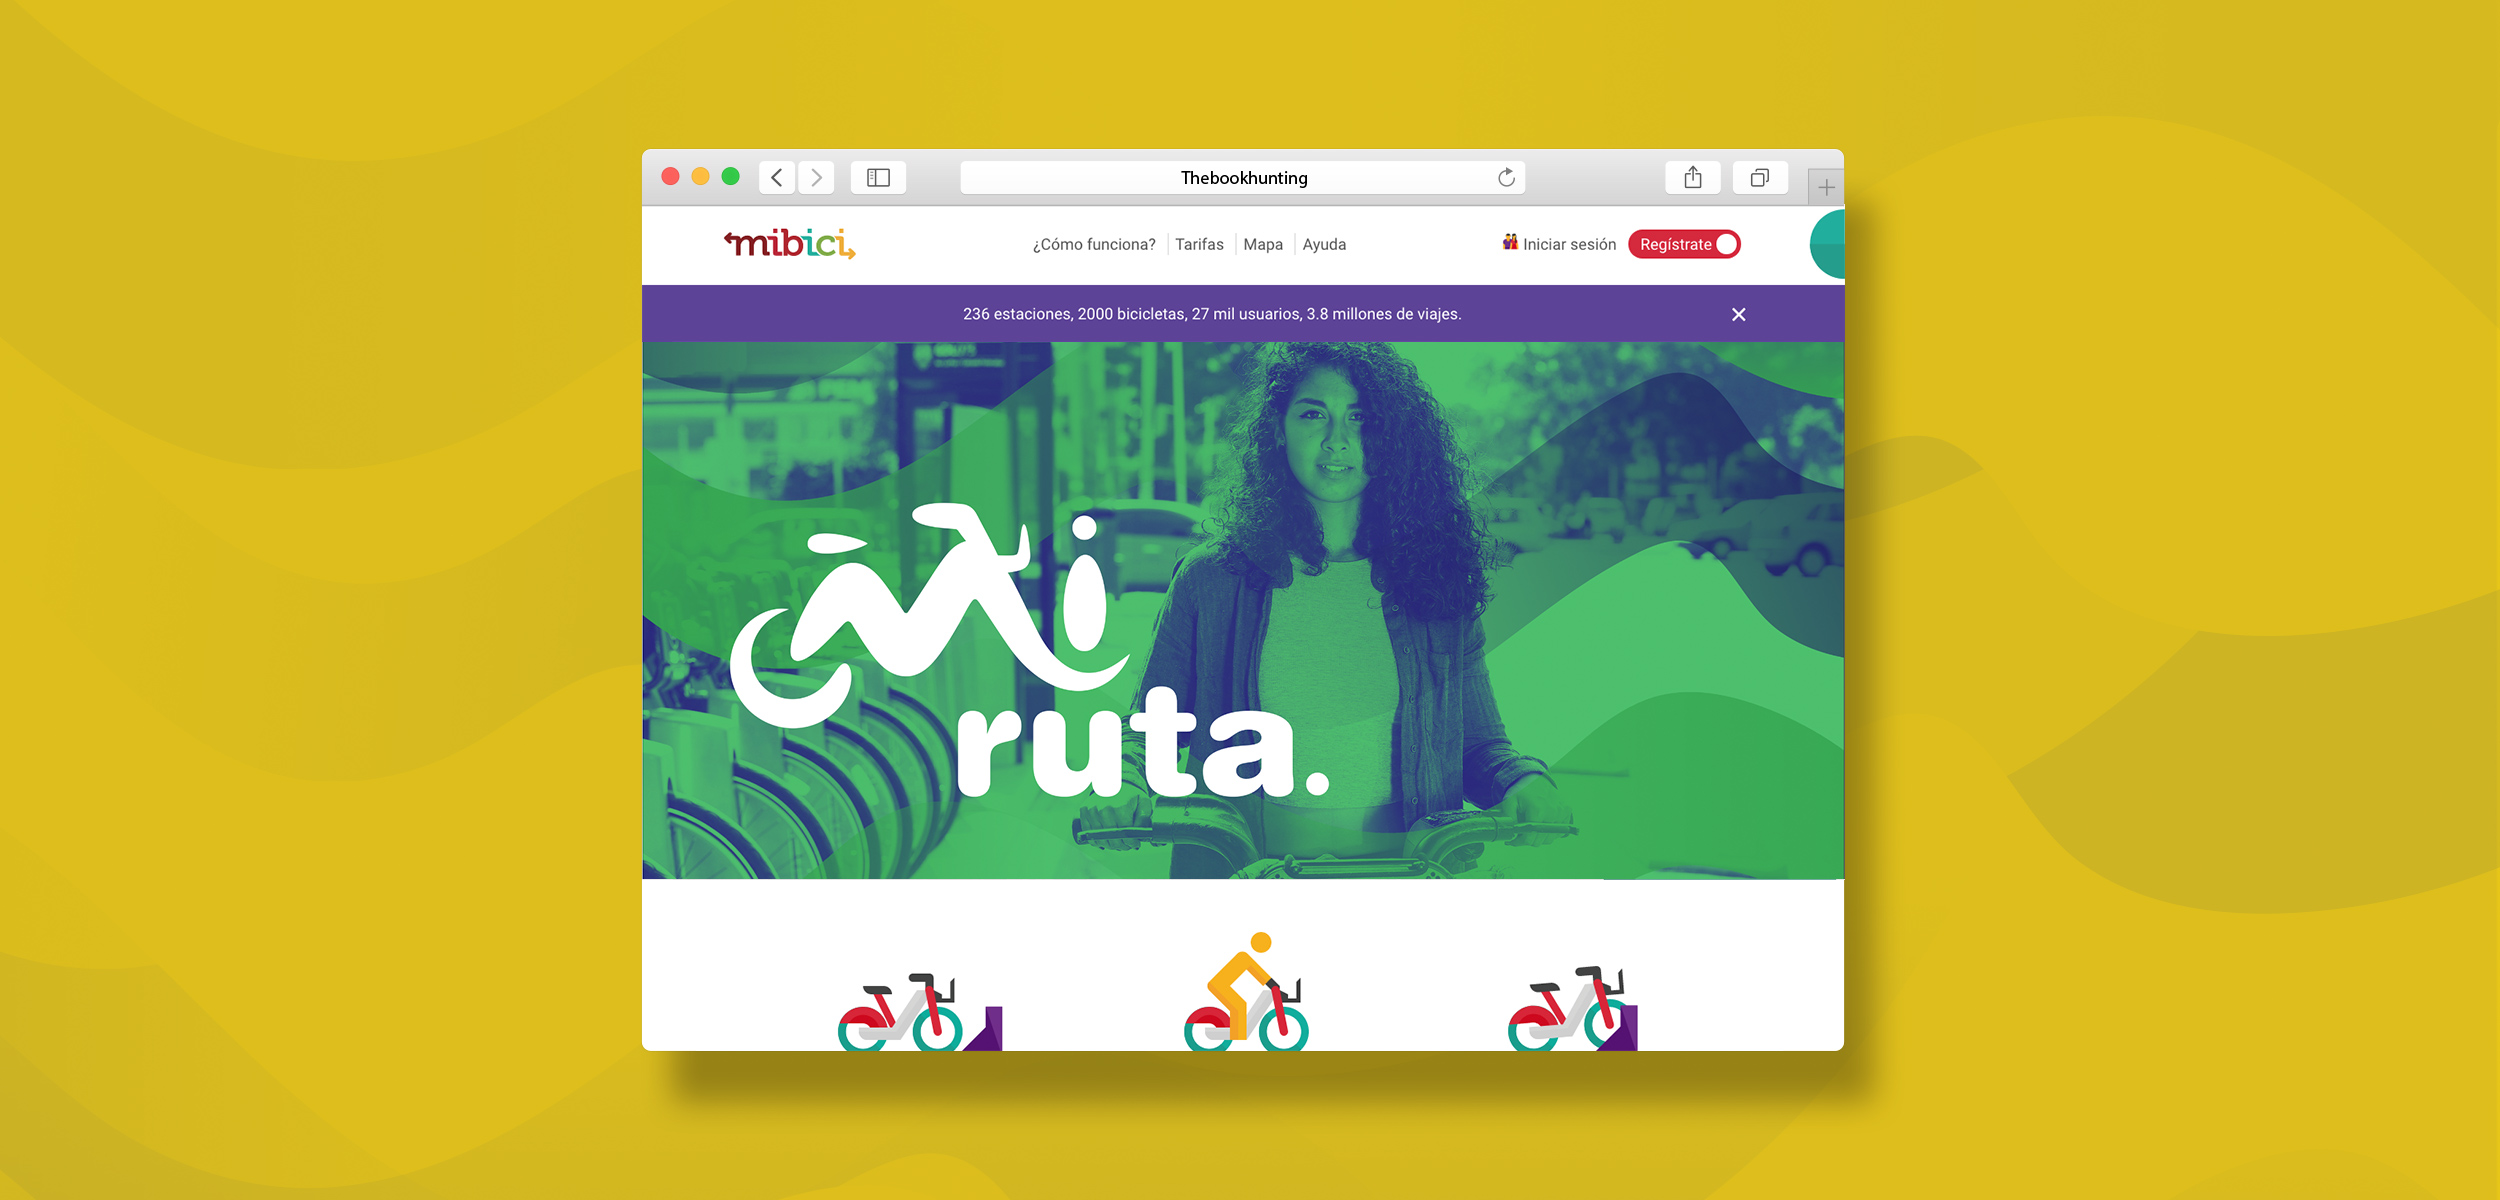 Mibici-screen.jpg